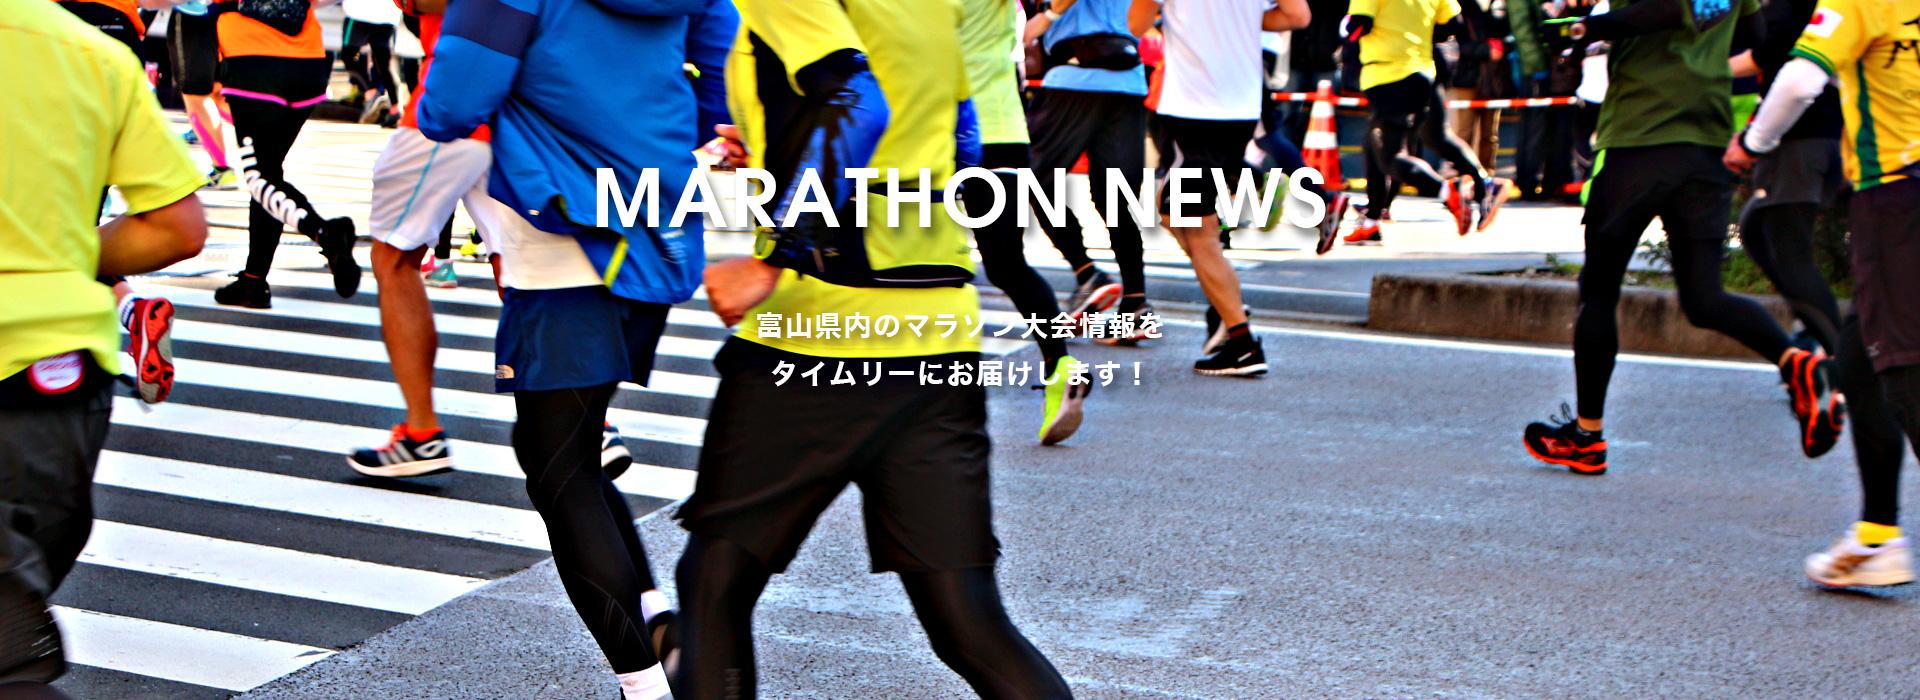 MARATHON NEWS